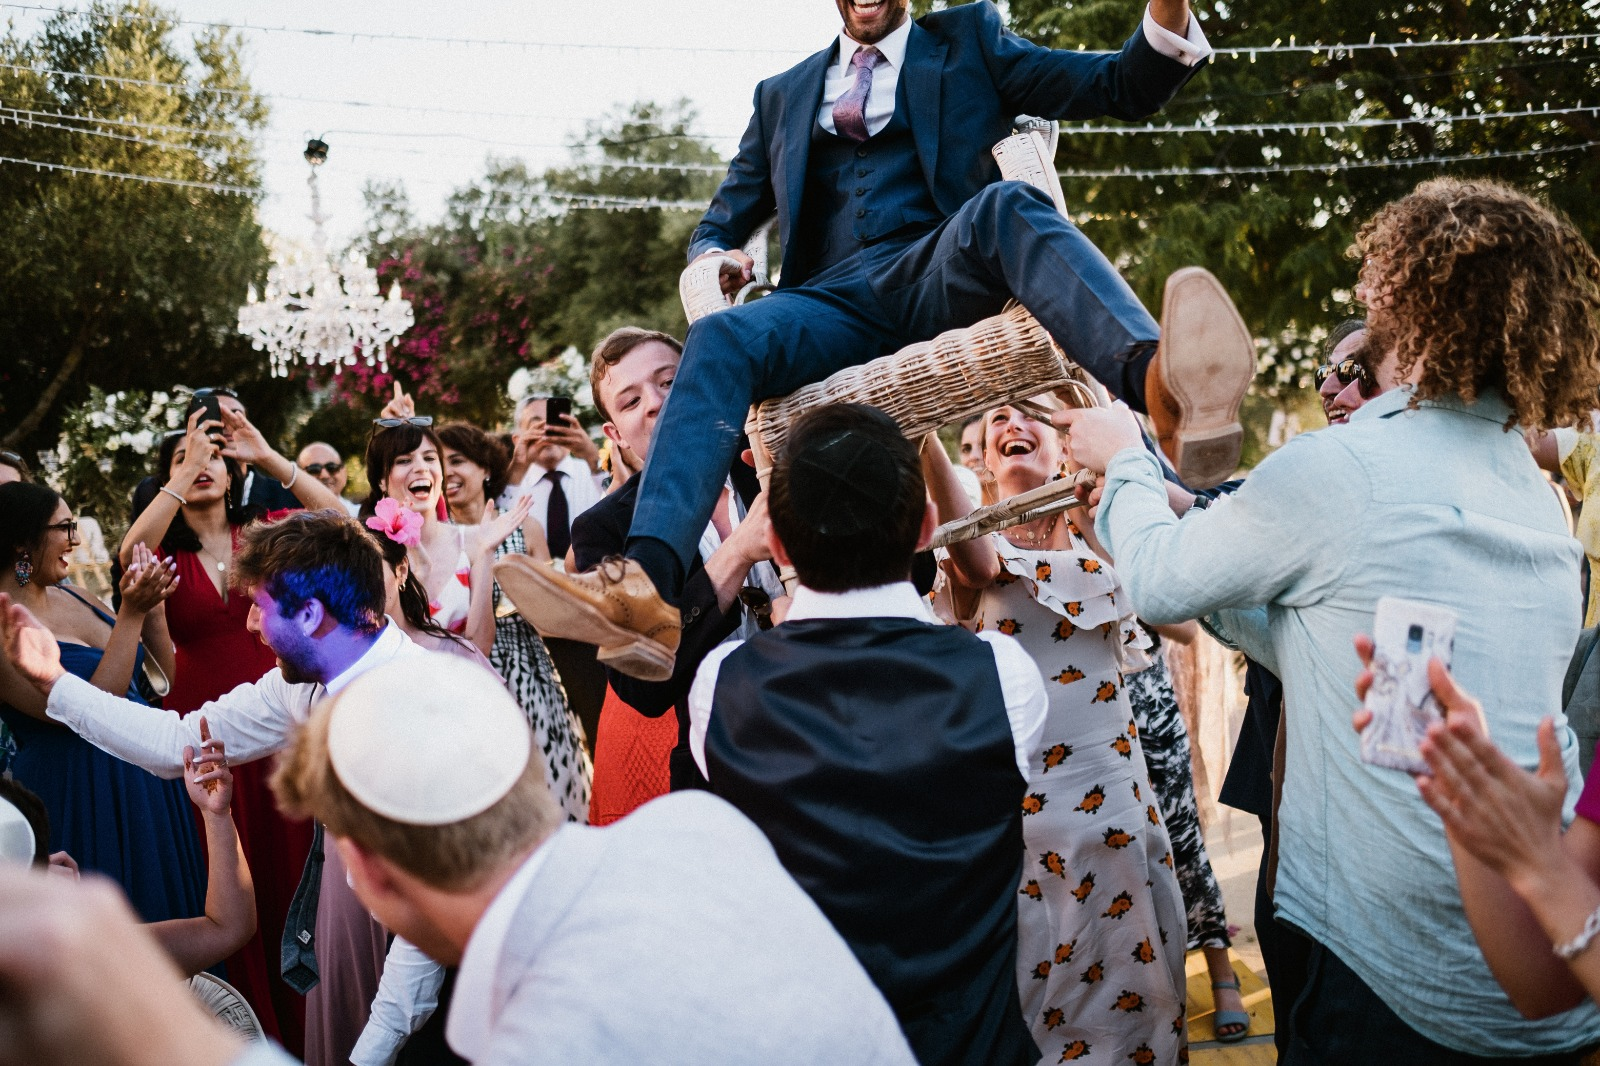 Jewish celebratory dance called the horah